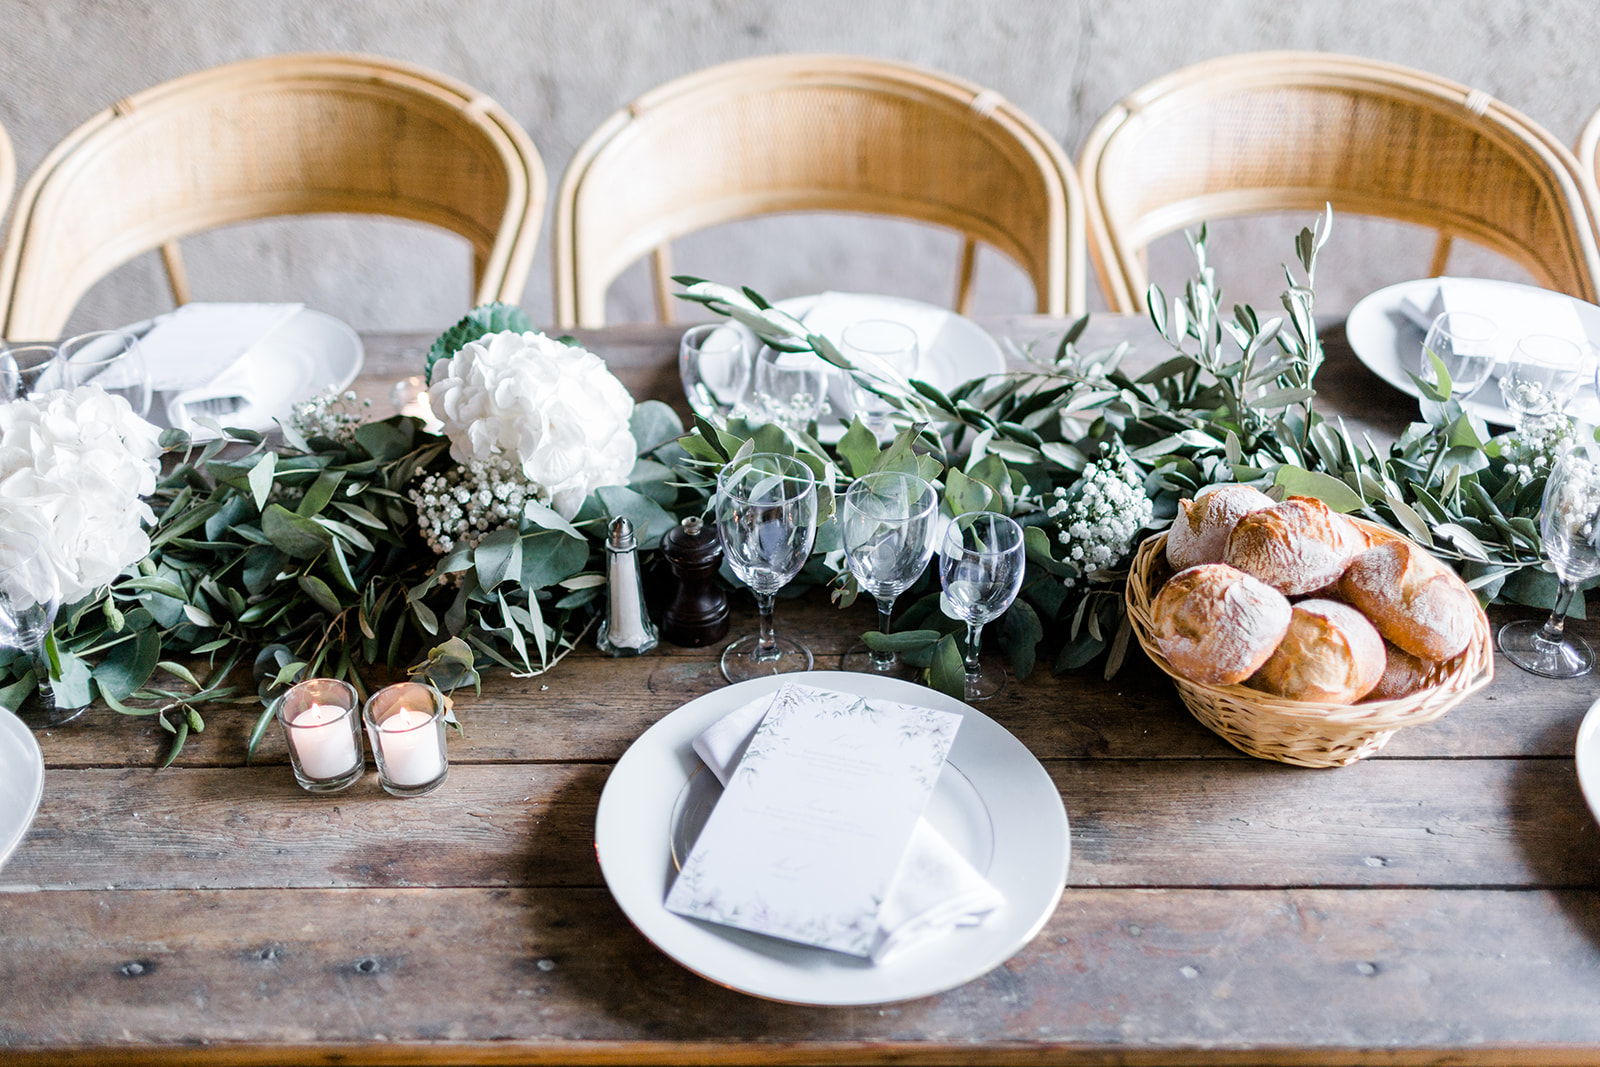 French Chateau Wedding, Events by Reagan, France Wedding, Destination Wedding Planner, Table setting, Flower table decor